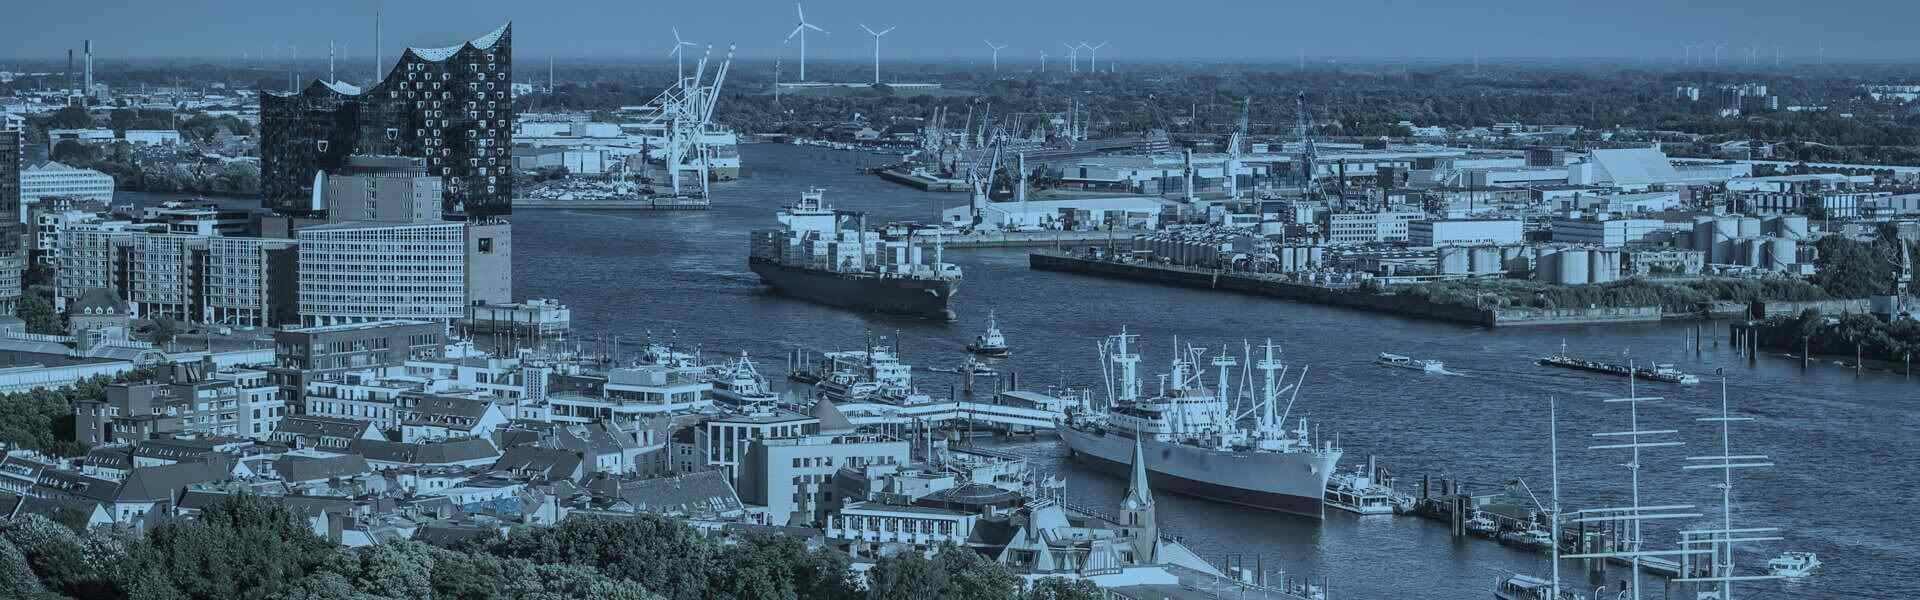 Aida Hafen Hamburg Fahrservice